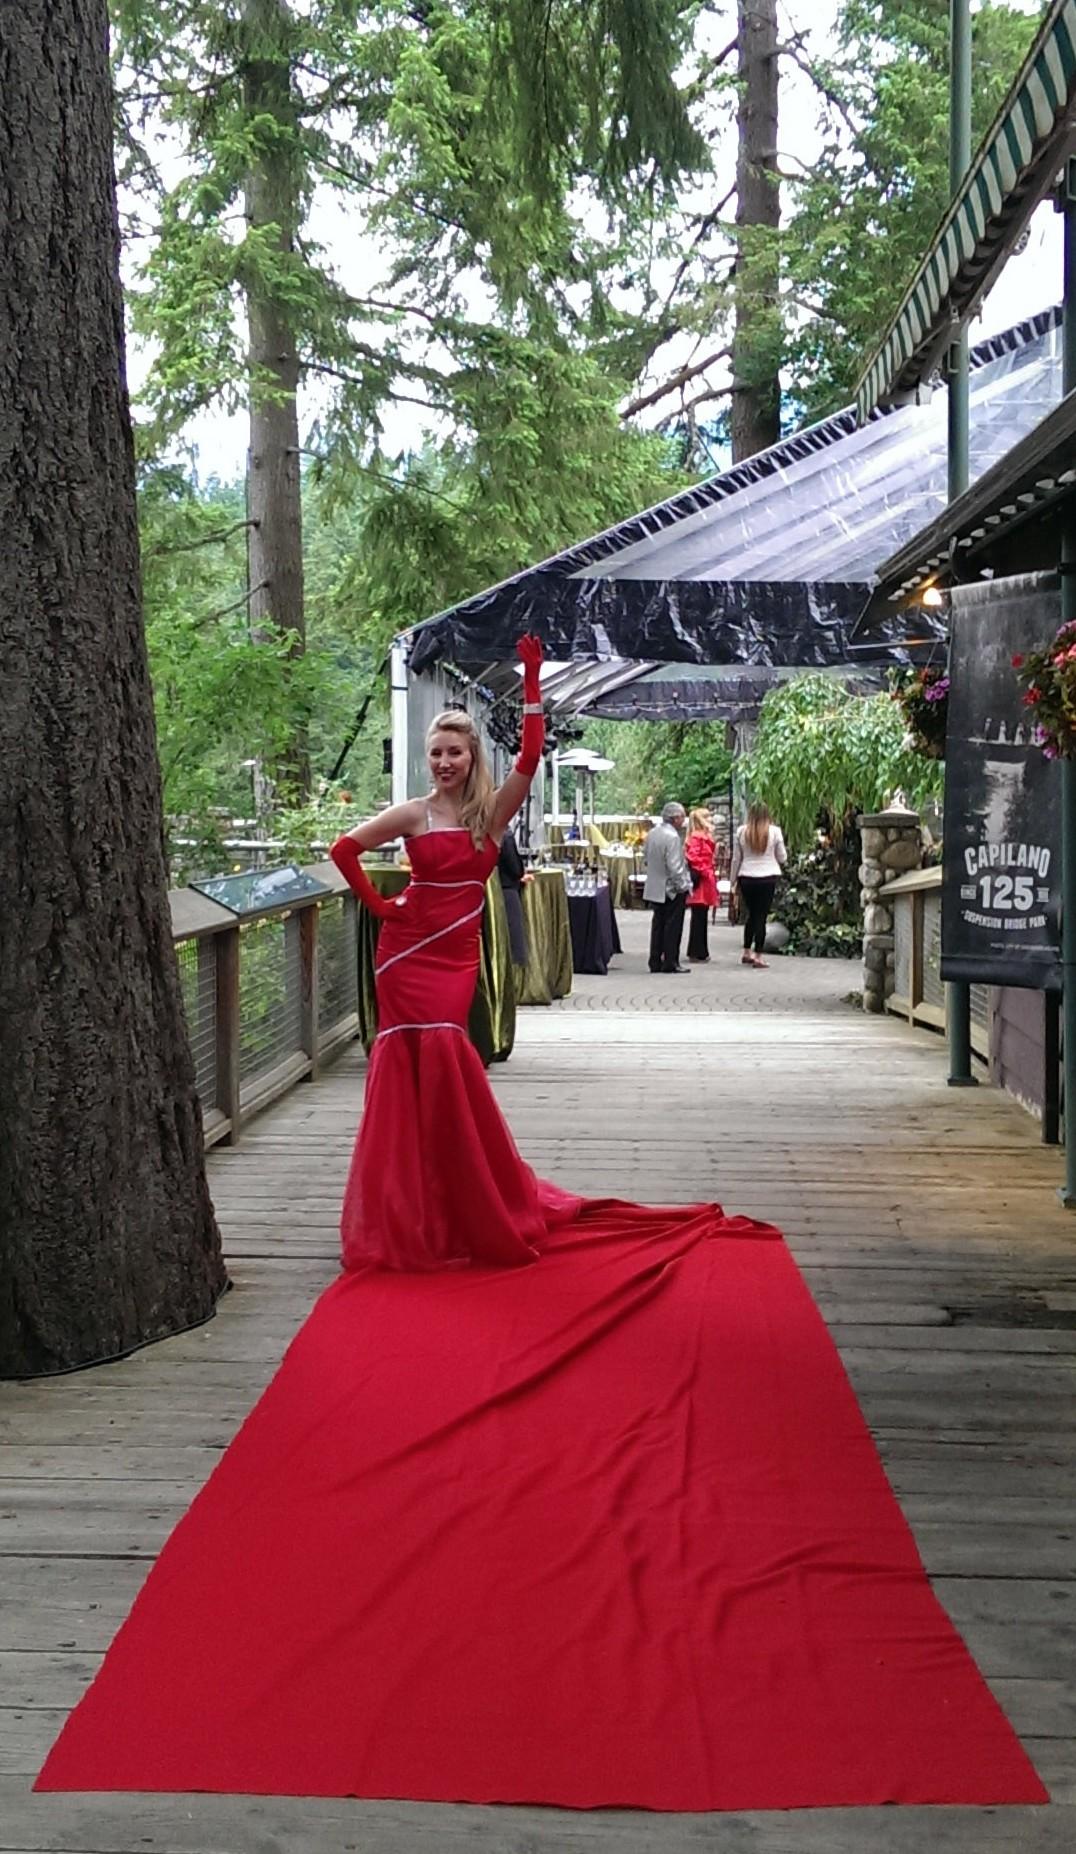 Red Carpet Dress2 -.jpg